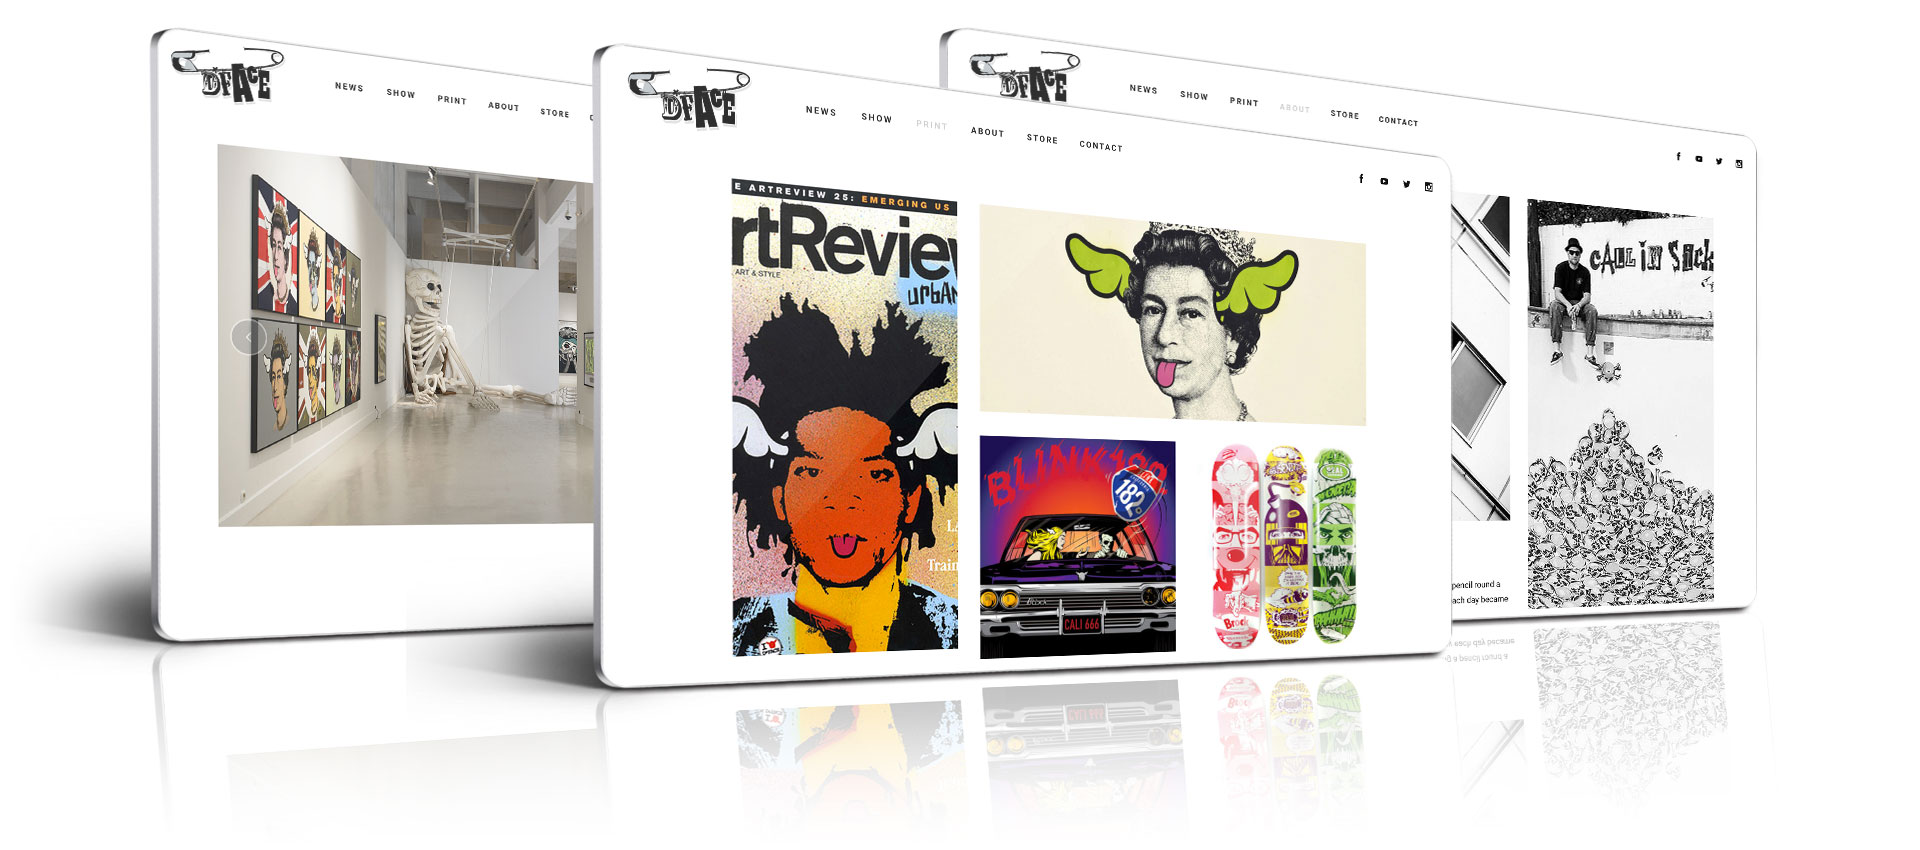 DFace - Website Design by Get New Design